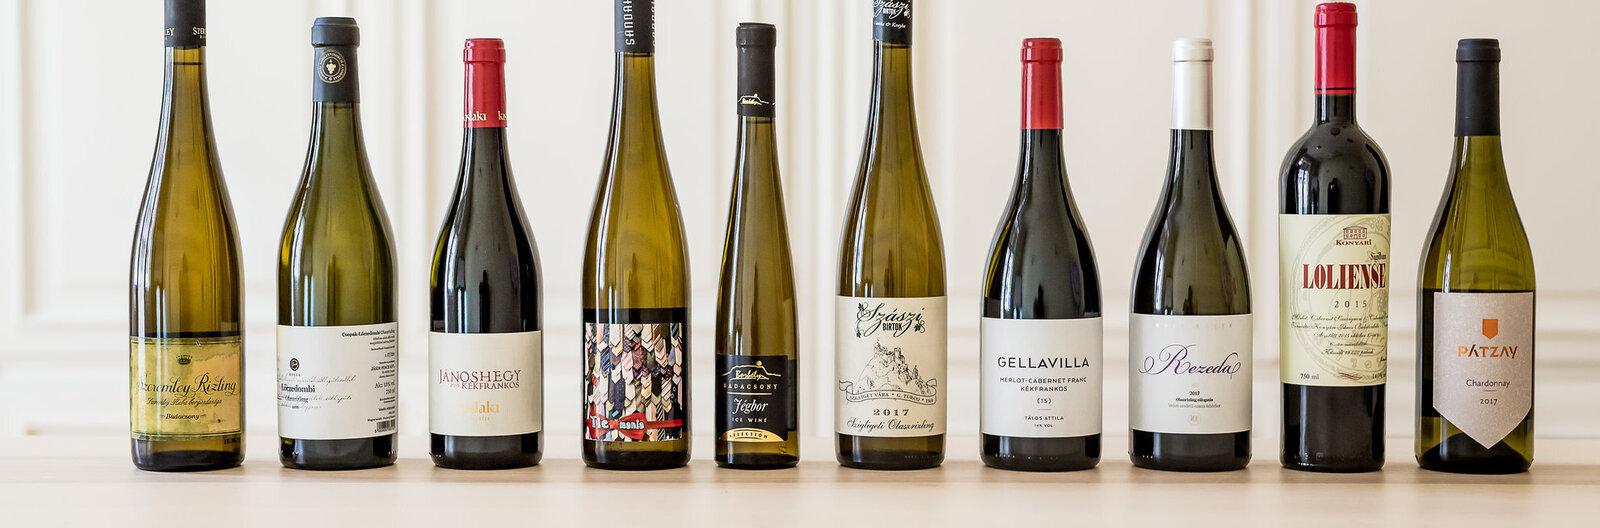 10 great Balaton wines for Christmas